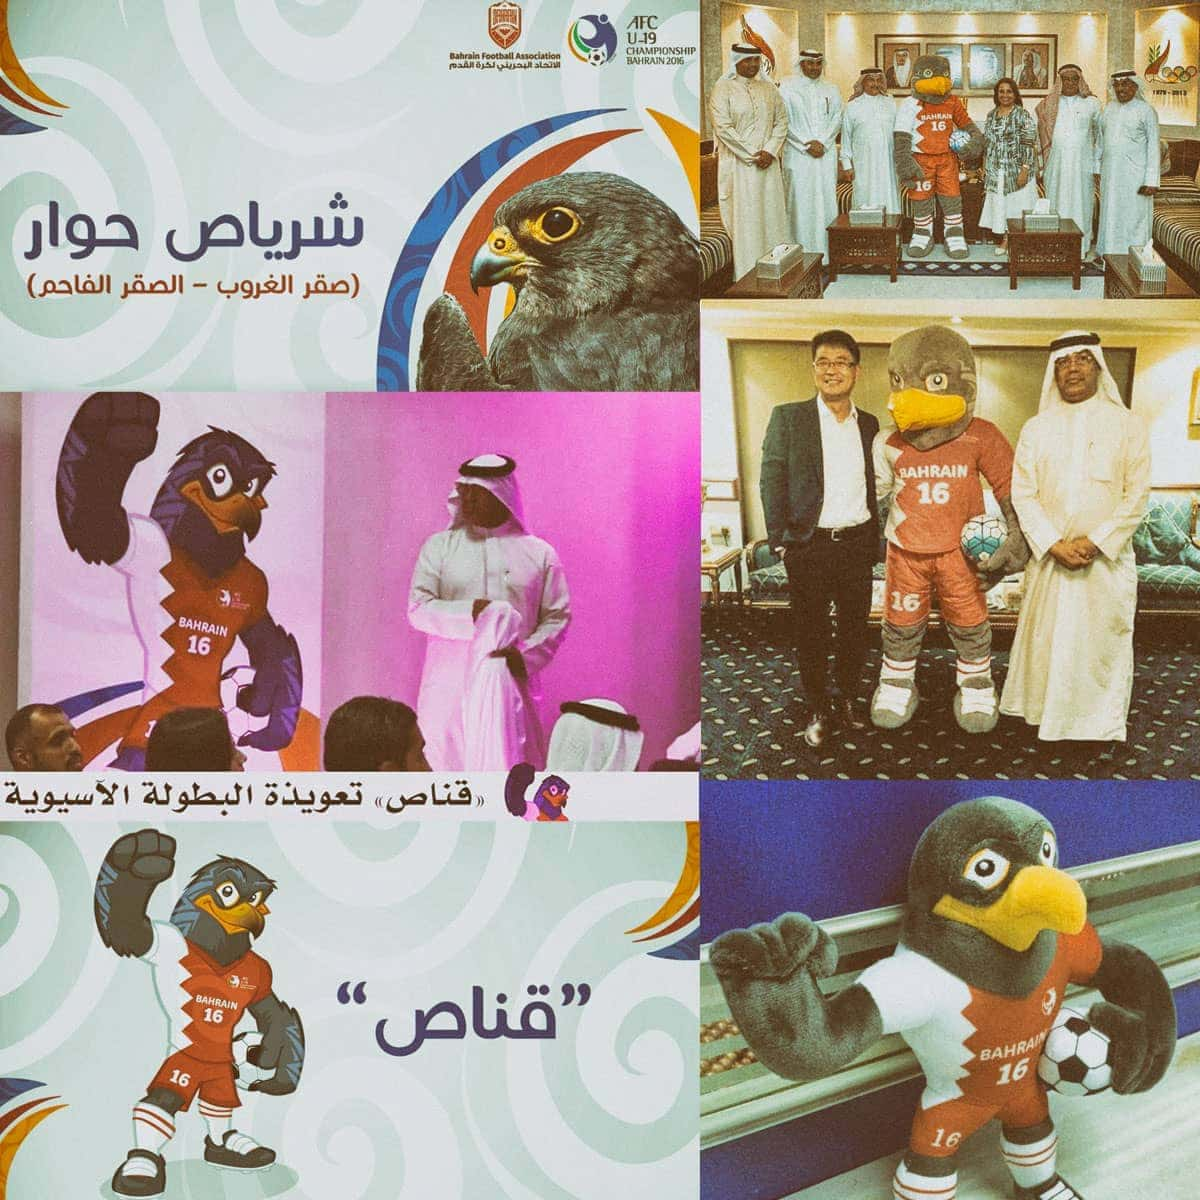 bahrein mascot costume